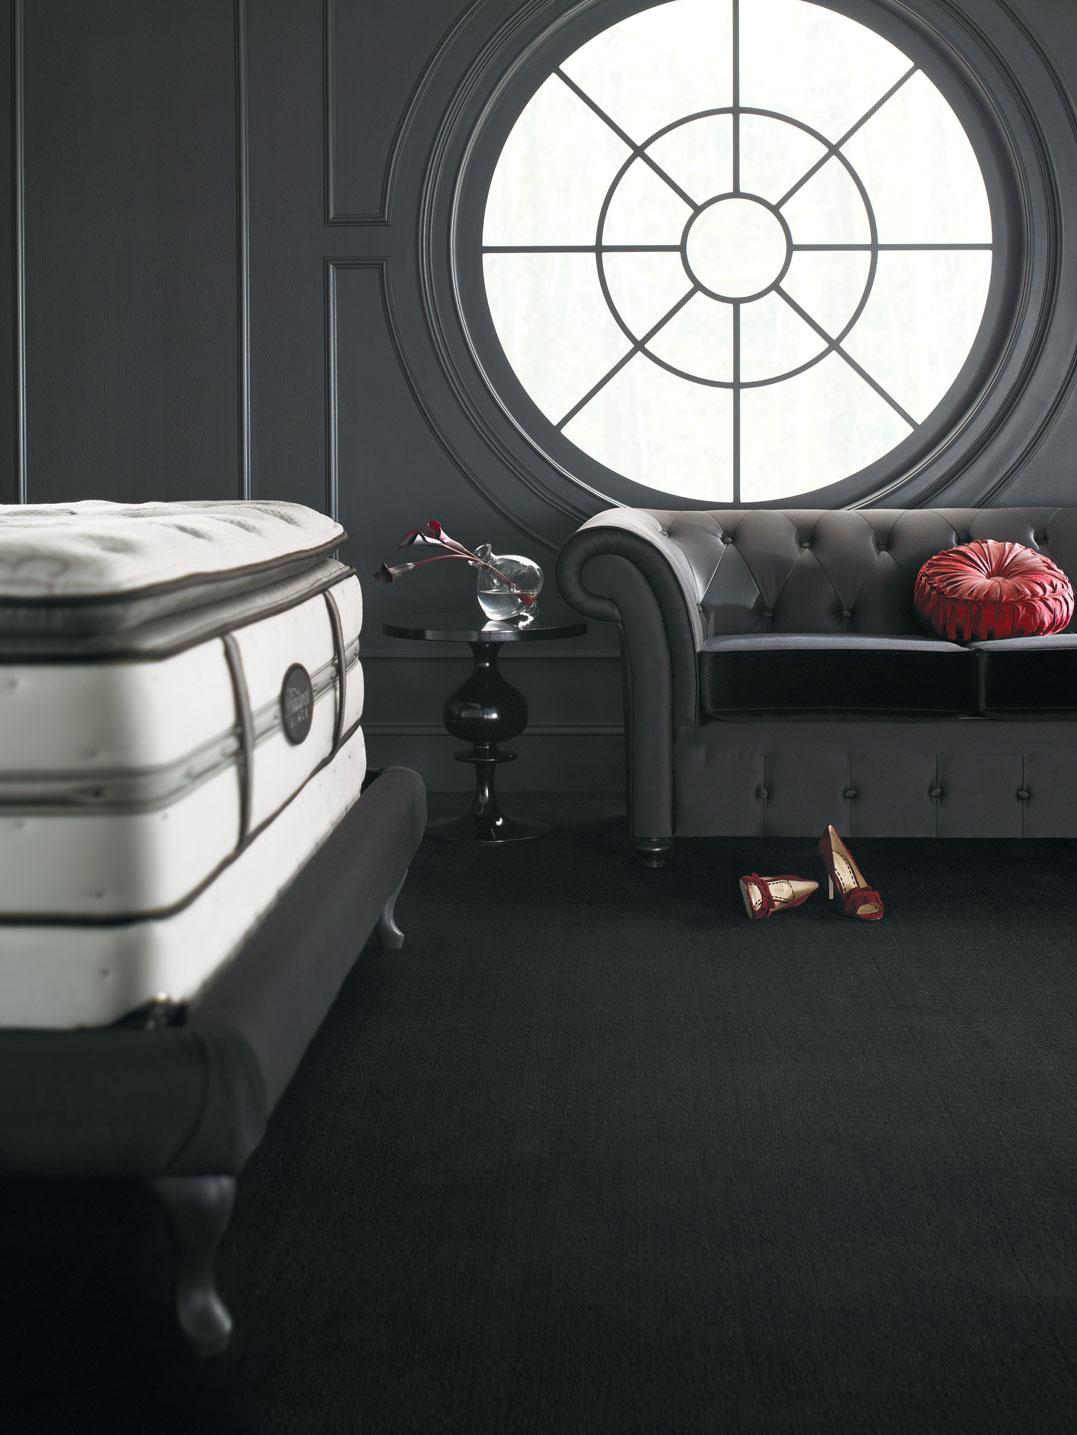 x - 2009 - Simmons Beautyrest Black - Sonya NxG™  Pillow Top